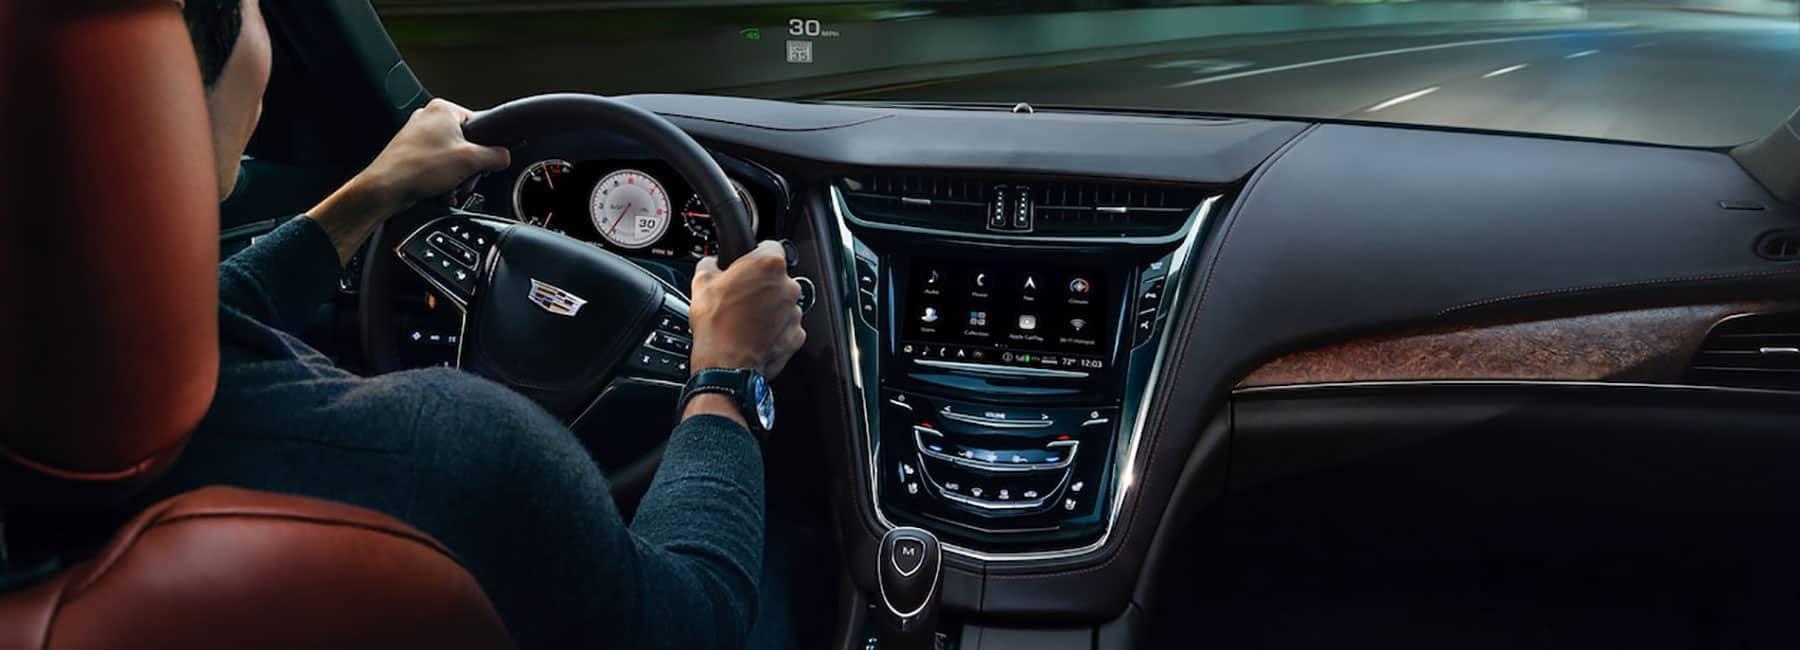 Cadillac-CTS-Sedan-Interior